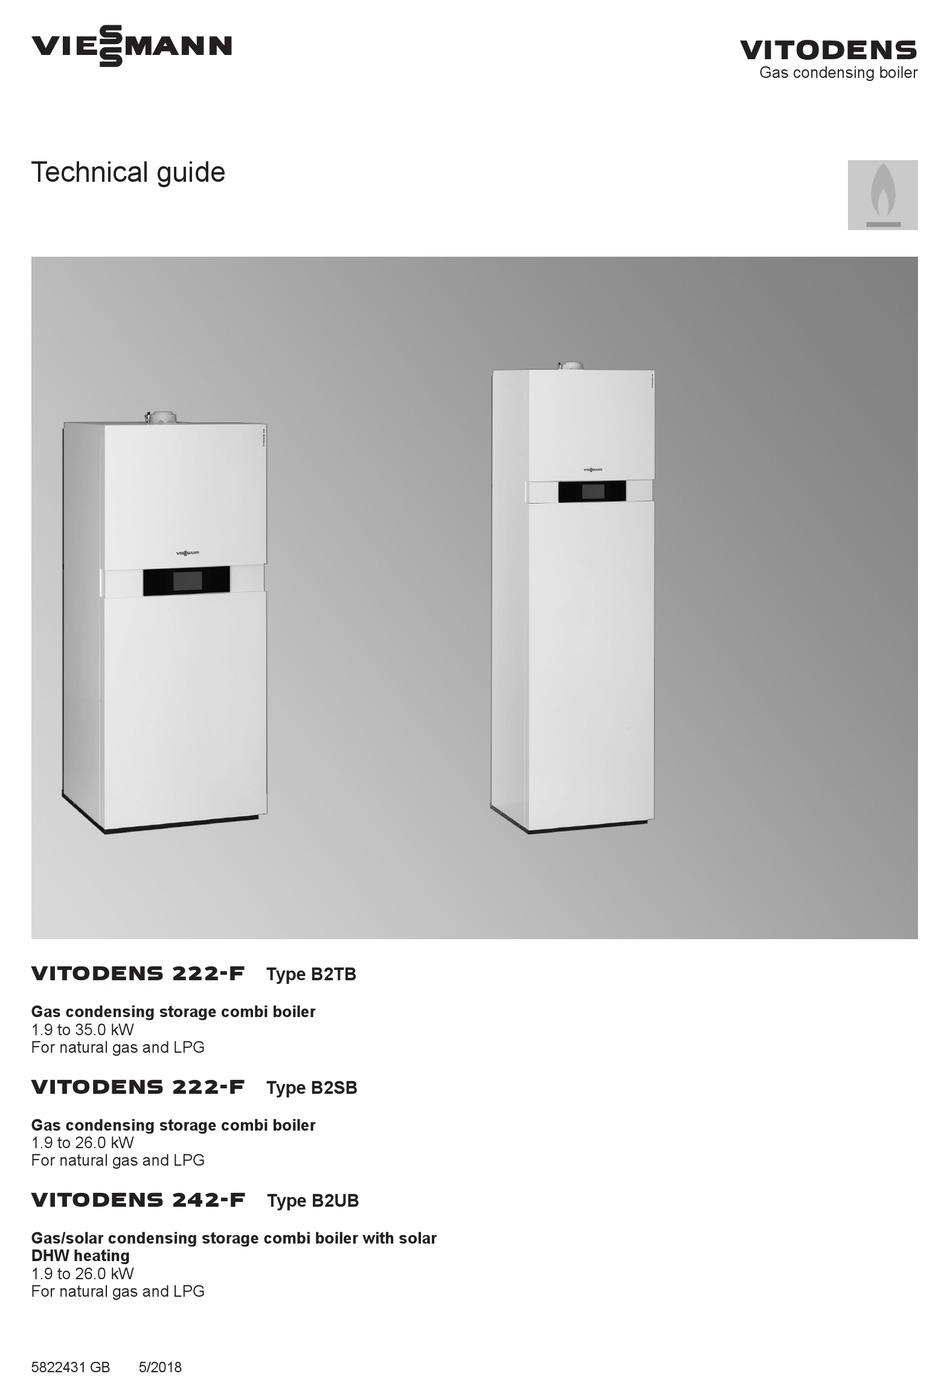 viessmann vitodens 050 manual pdf